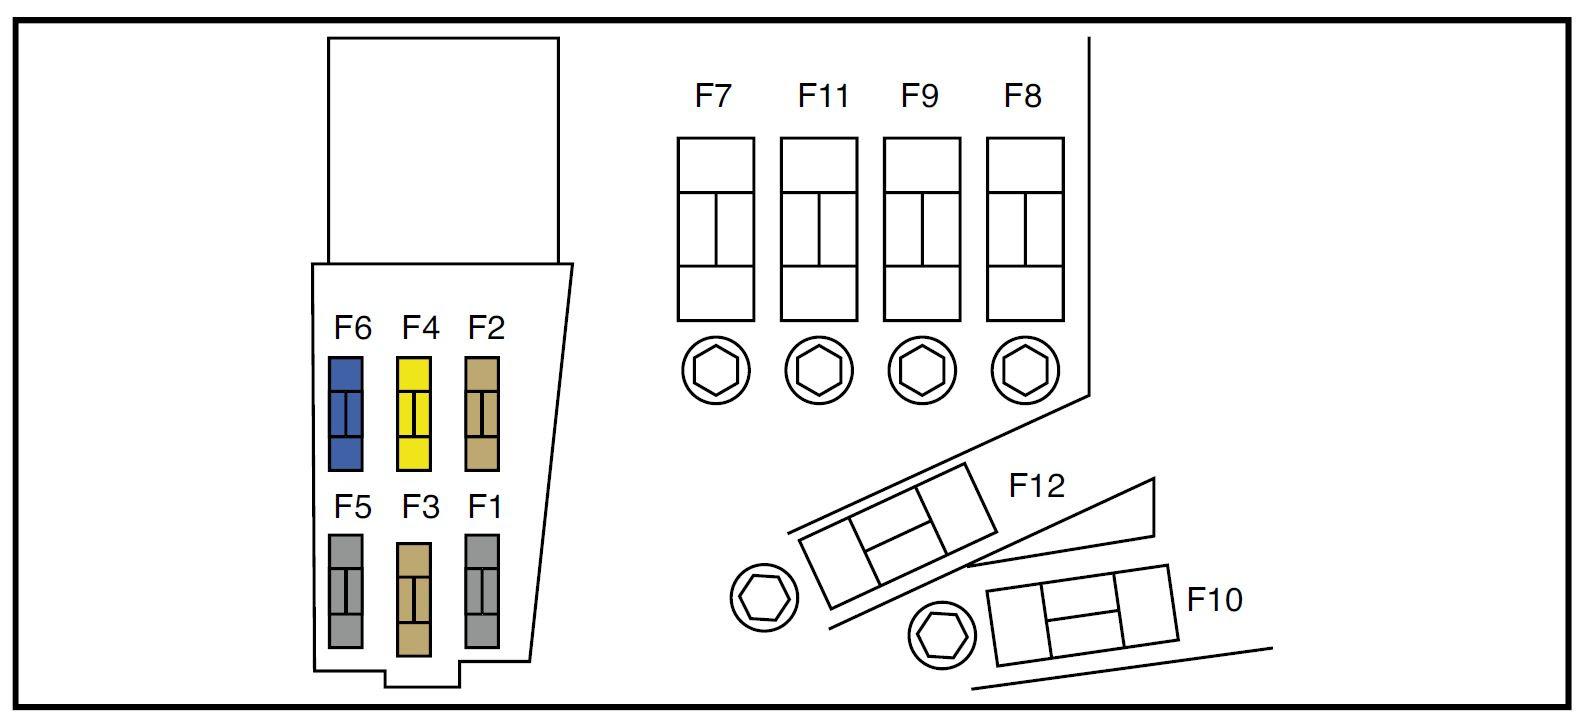 Peugeot Rcz Wiring Diagram Fuse Box 1995 Oldsmobile Cutlass Supreme Wiring Diagram Schematics